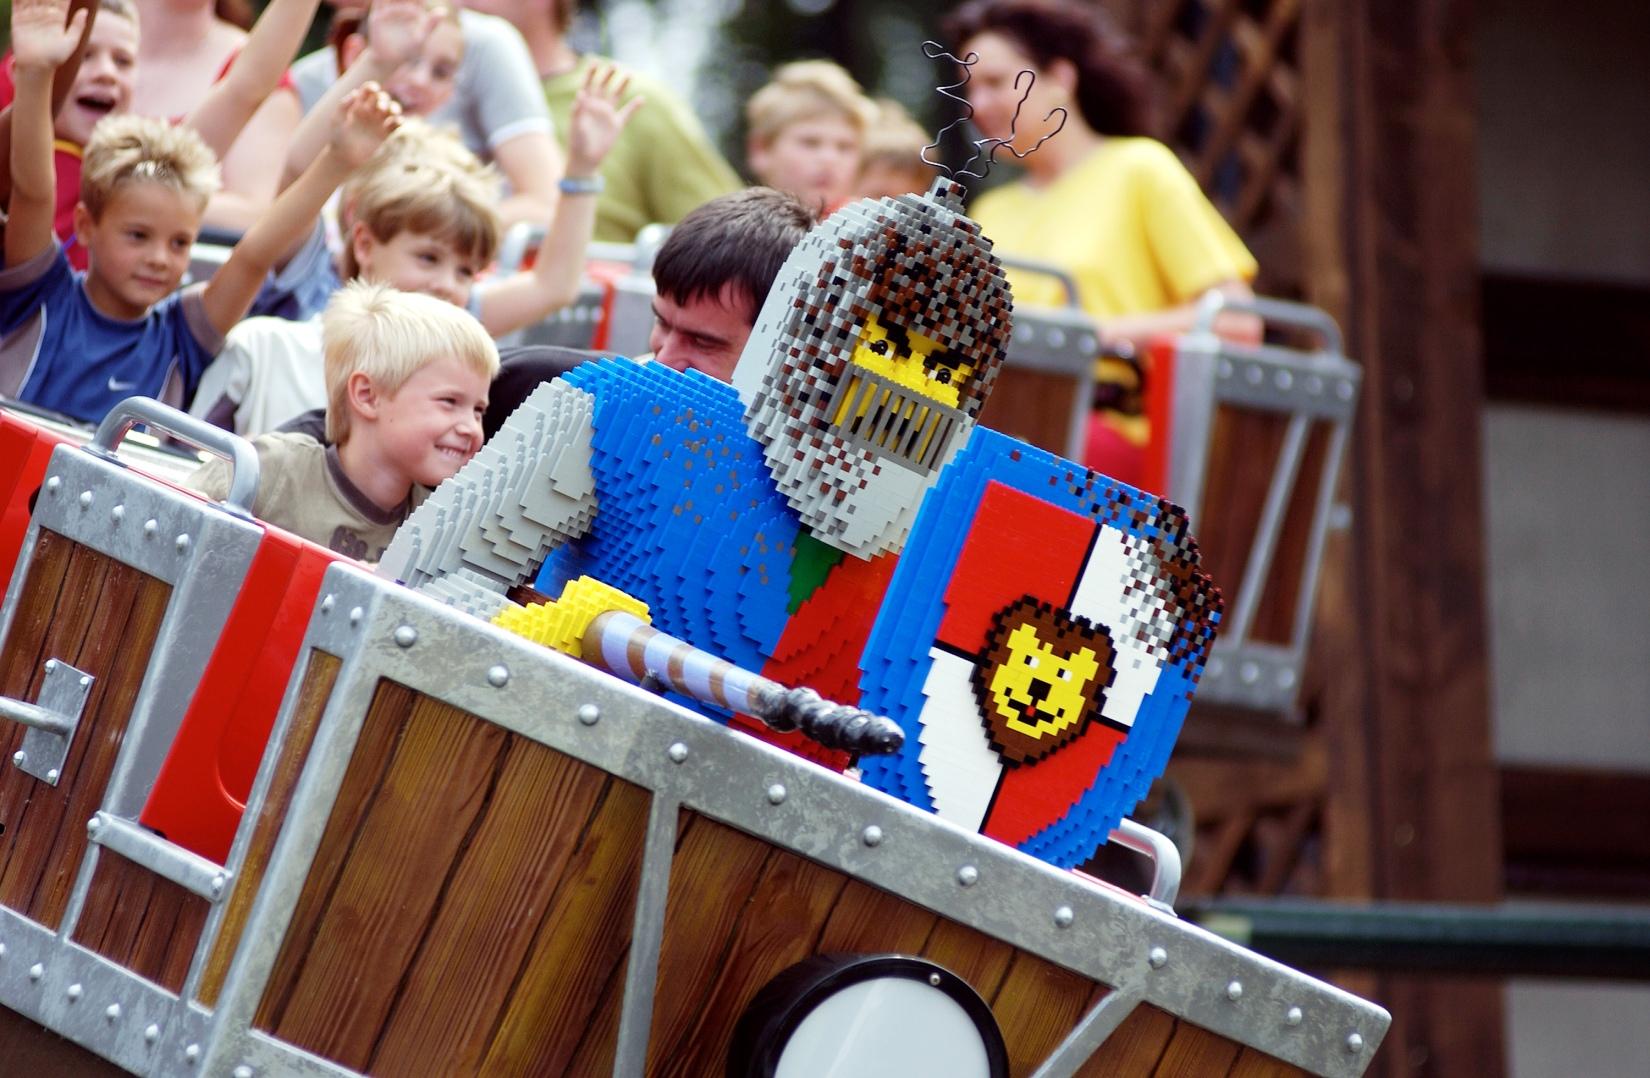 Drachenjagd in Legoland Deutschland